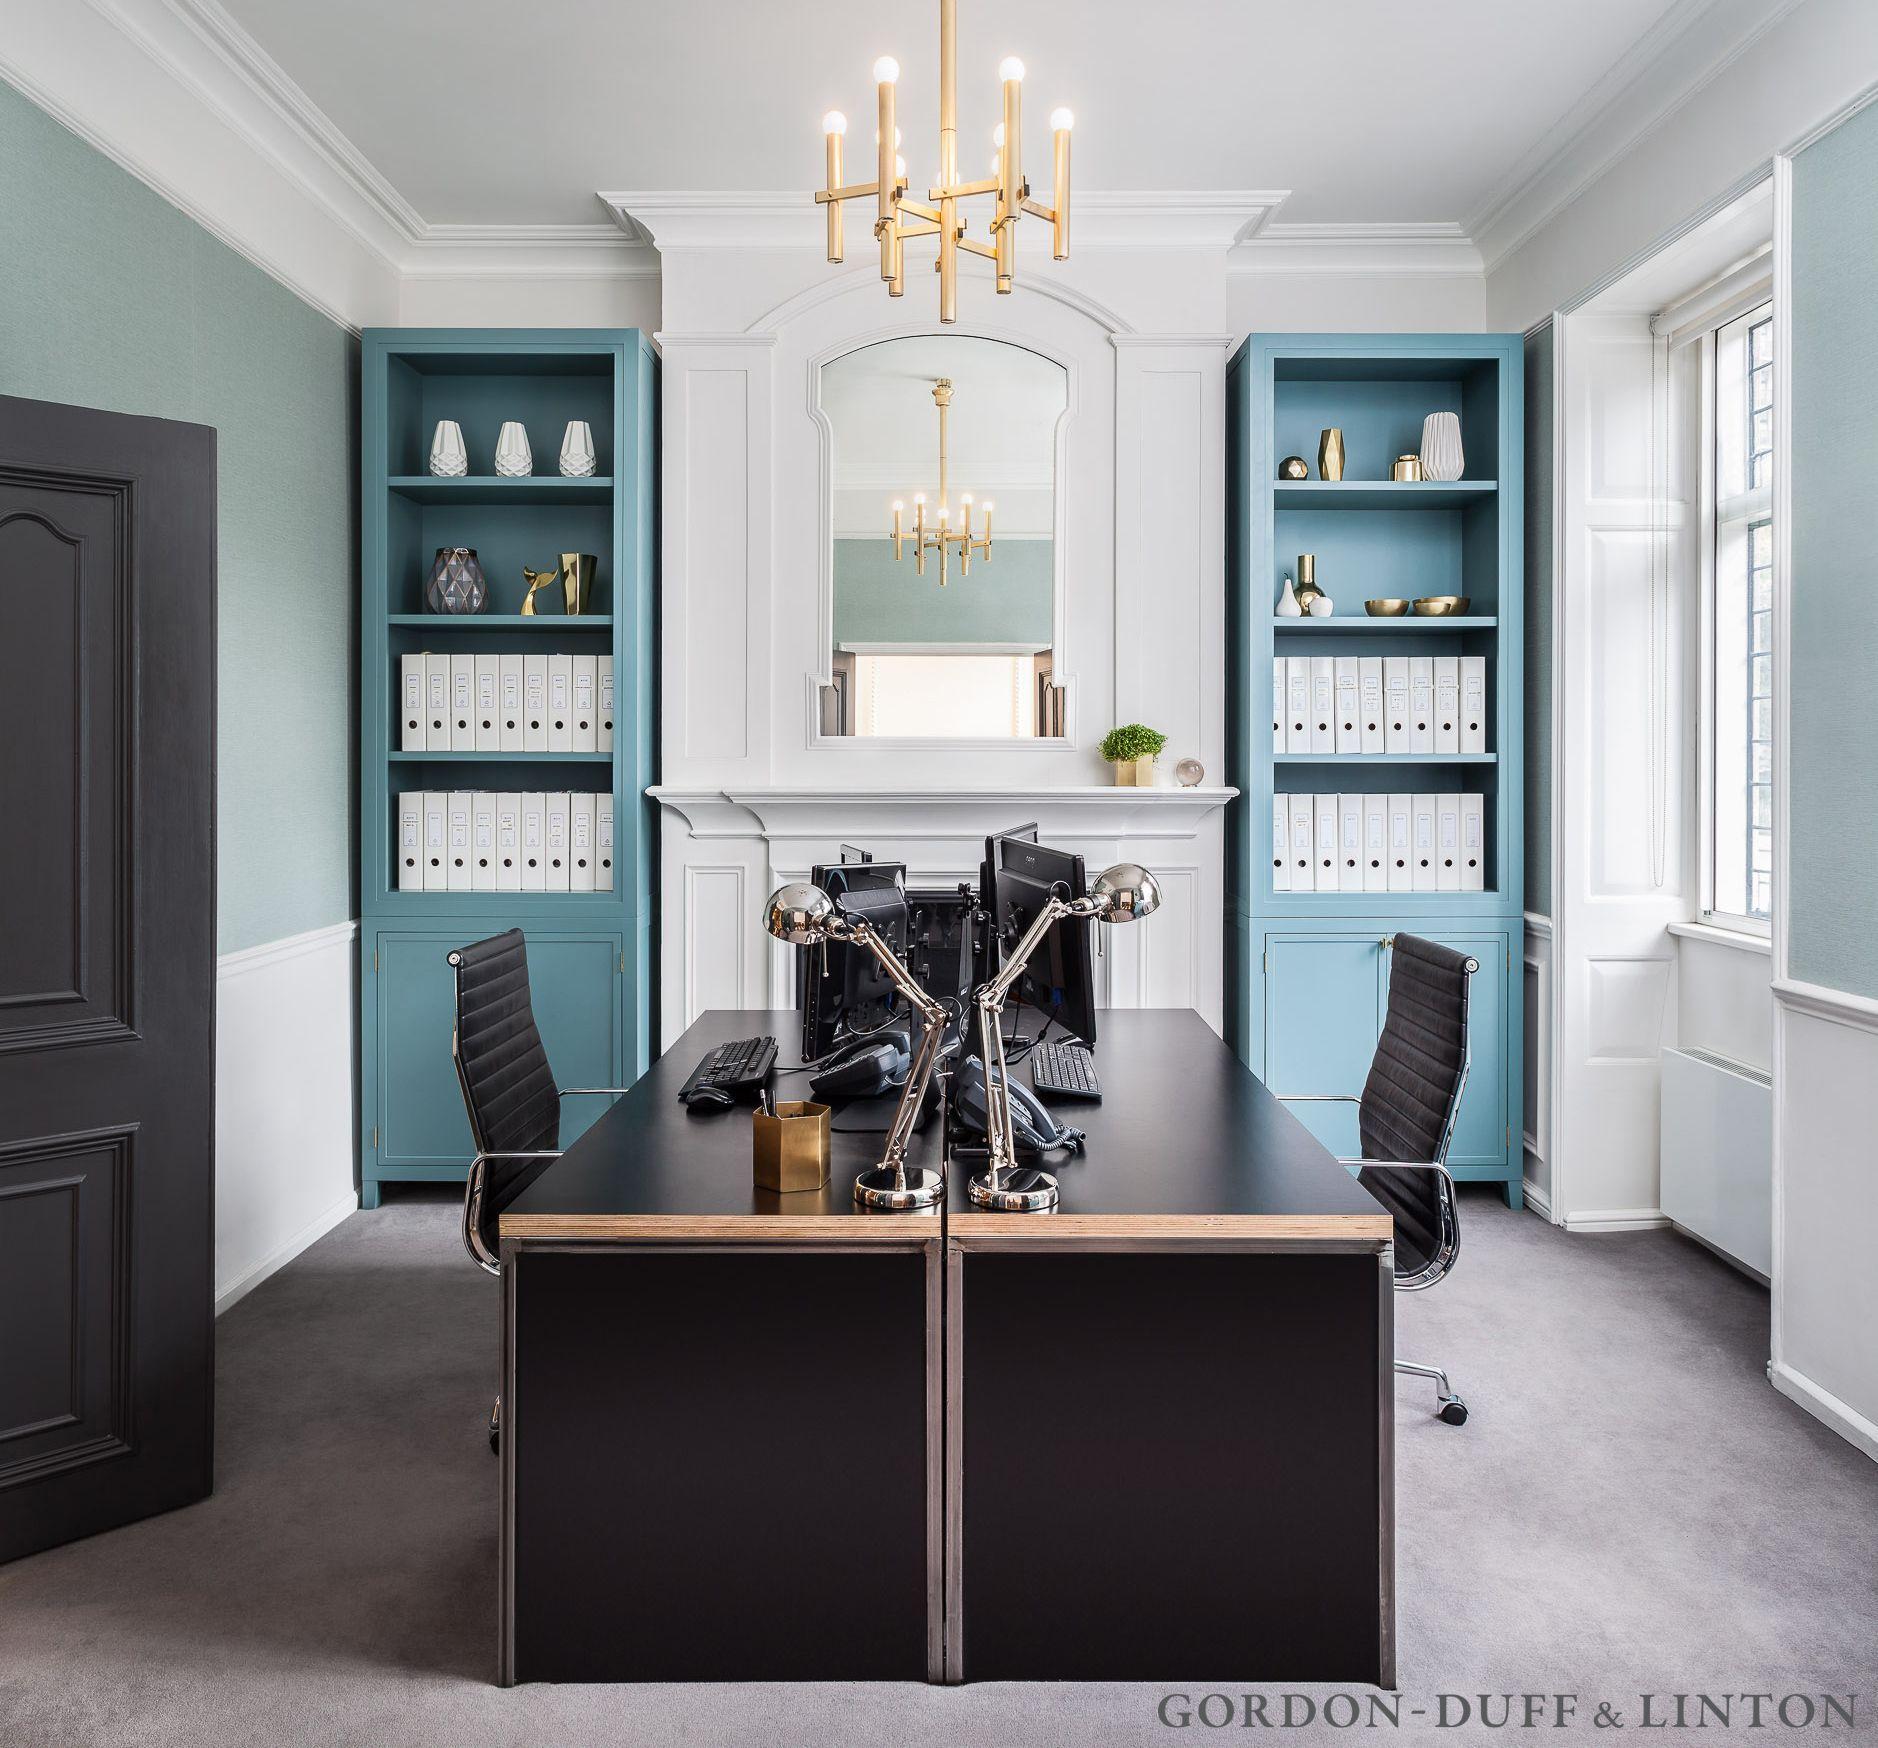 Sloane Street Apartments: Sloane Street – Gordon Duff & Linton